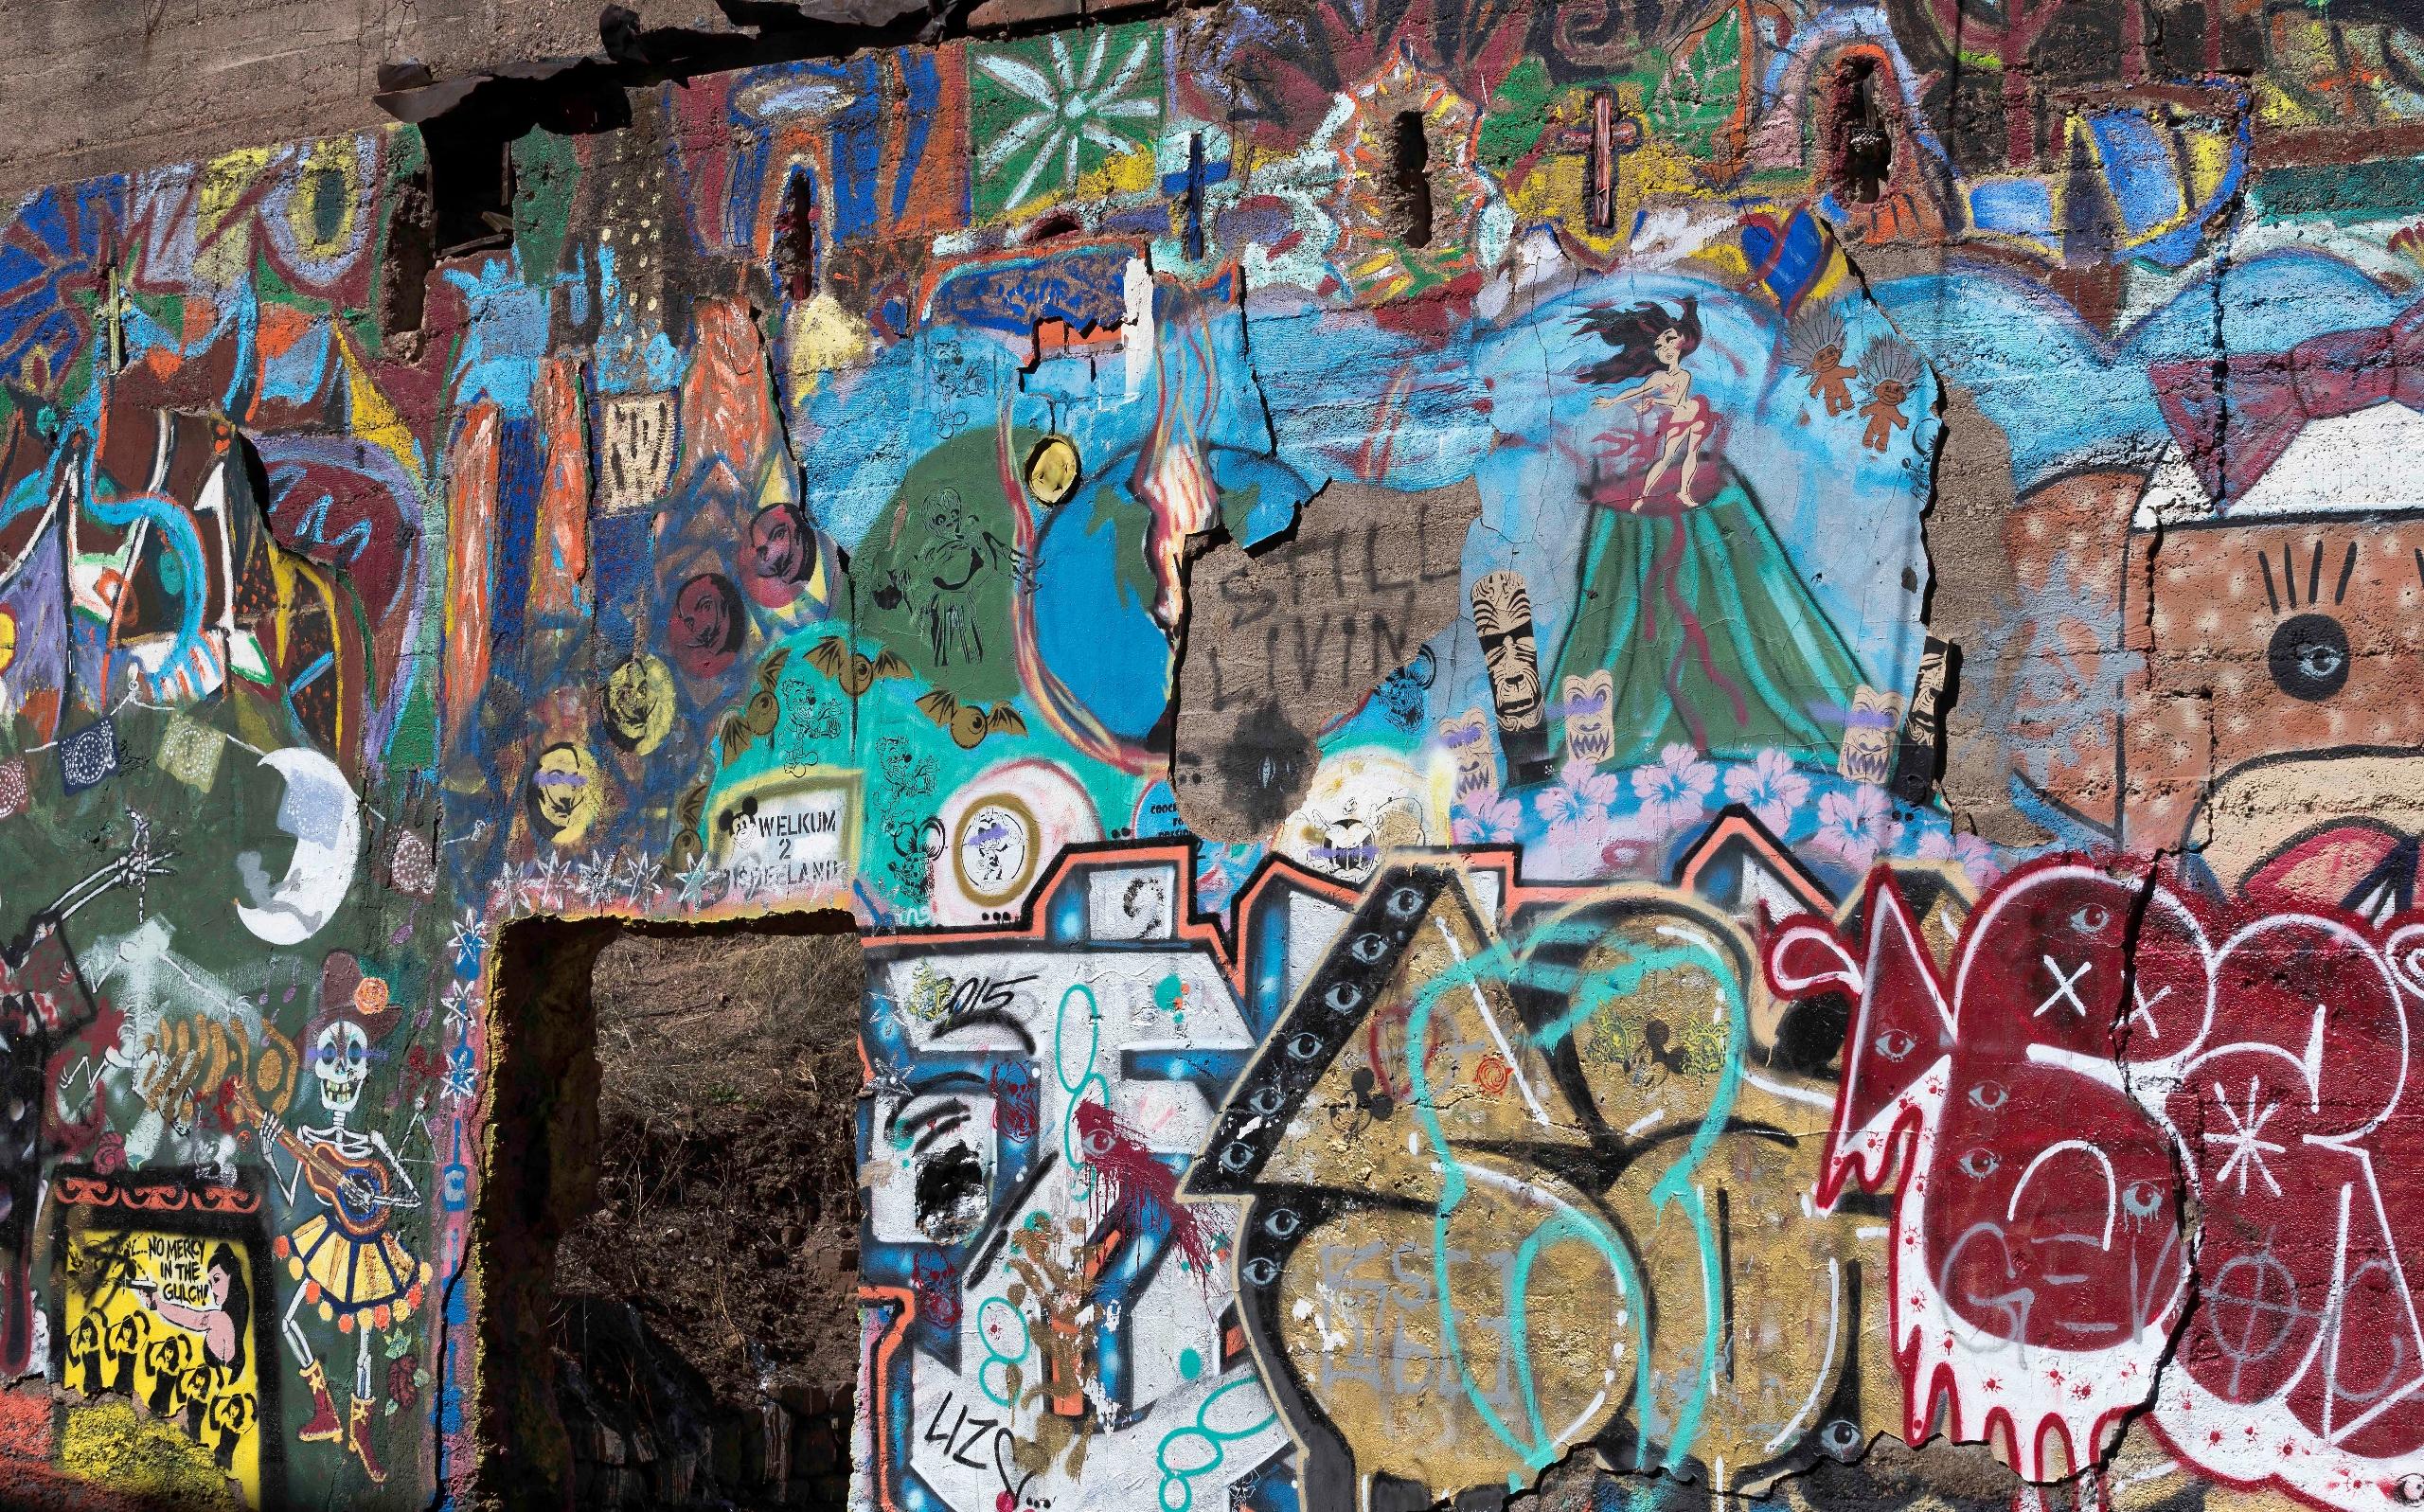 Bisbee Arizona, 2017 hike stair - azdrk | ello